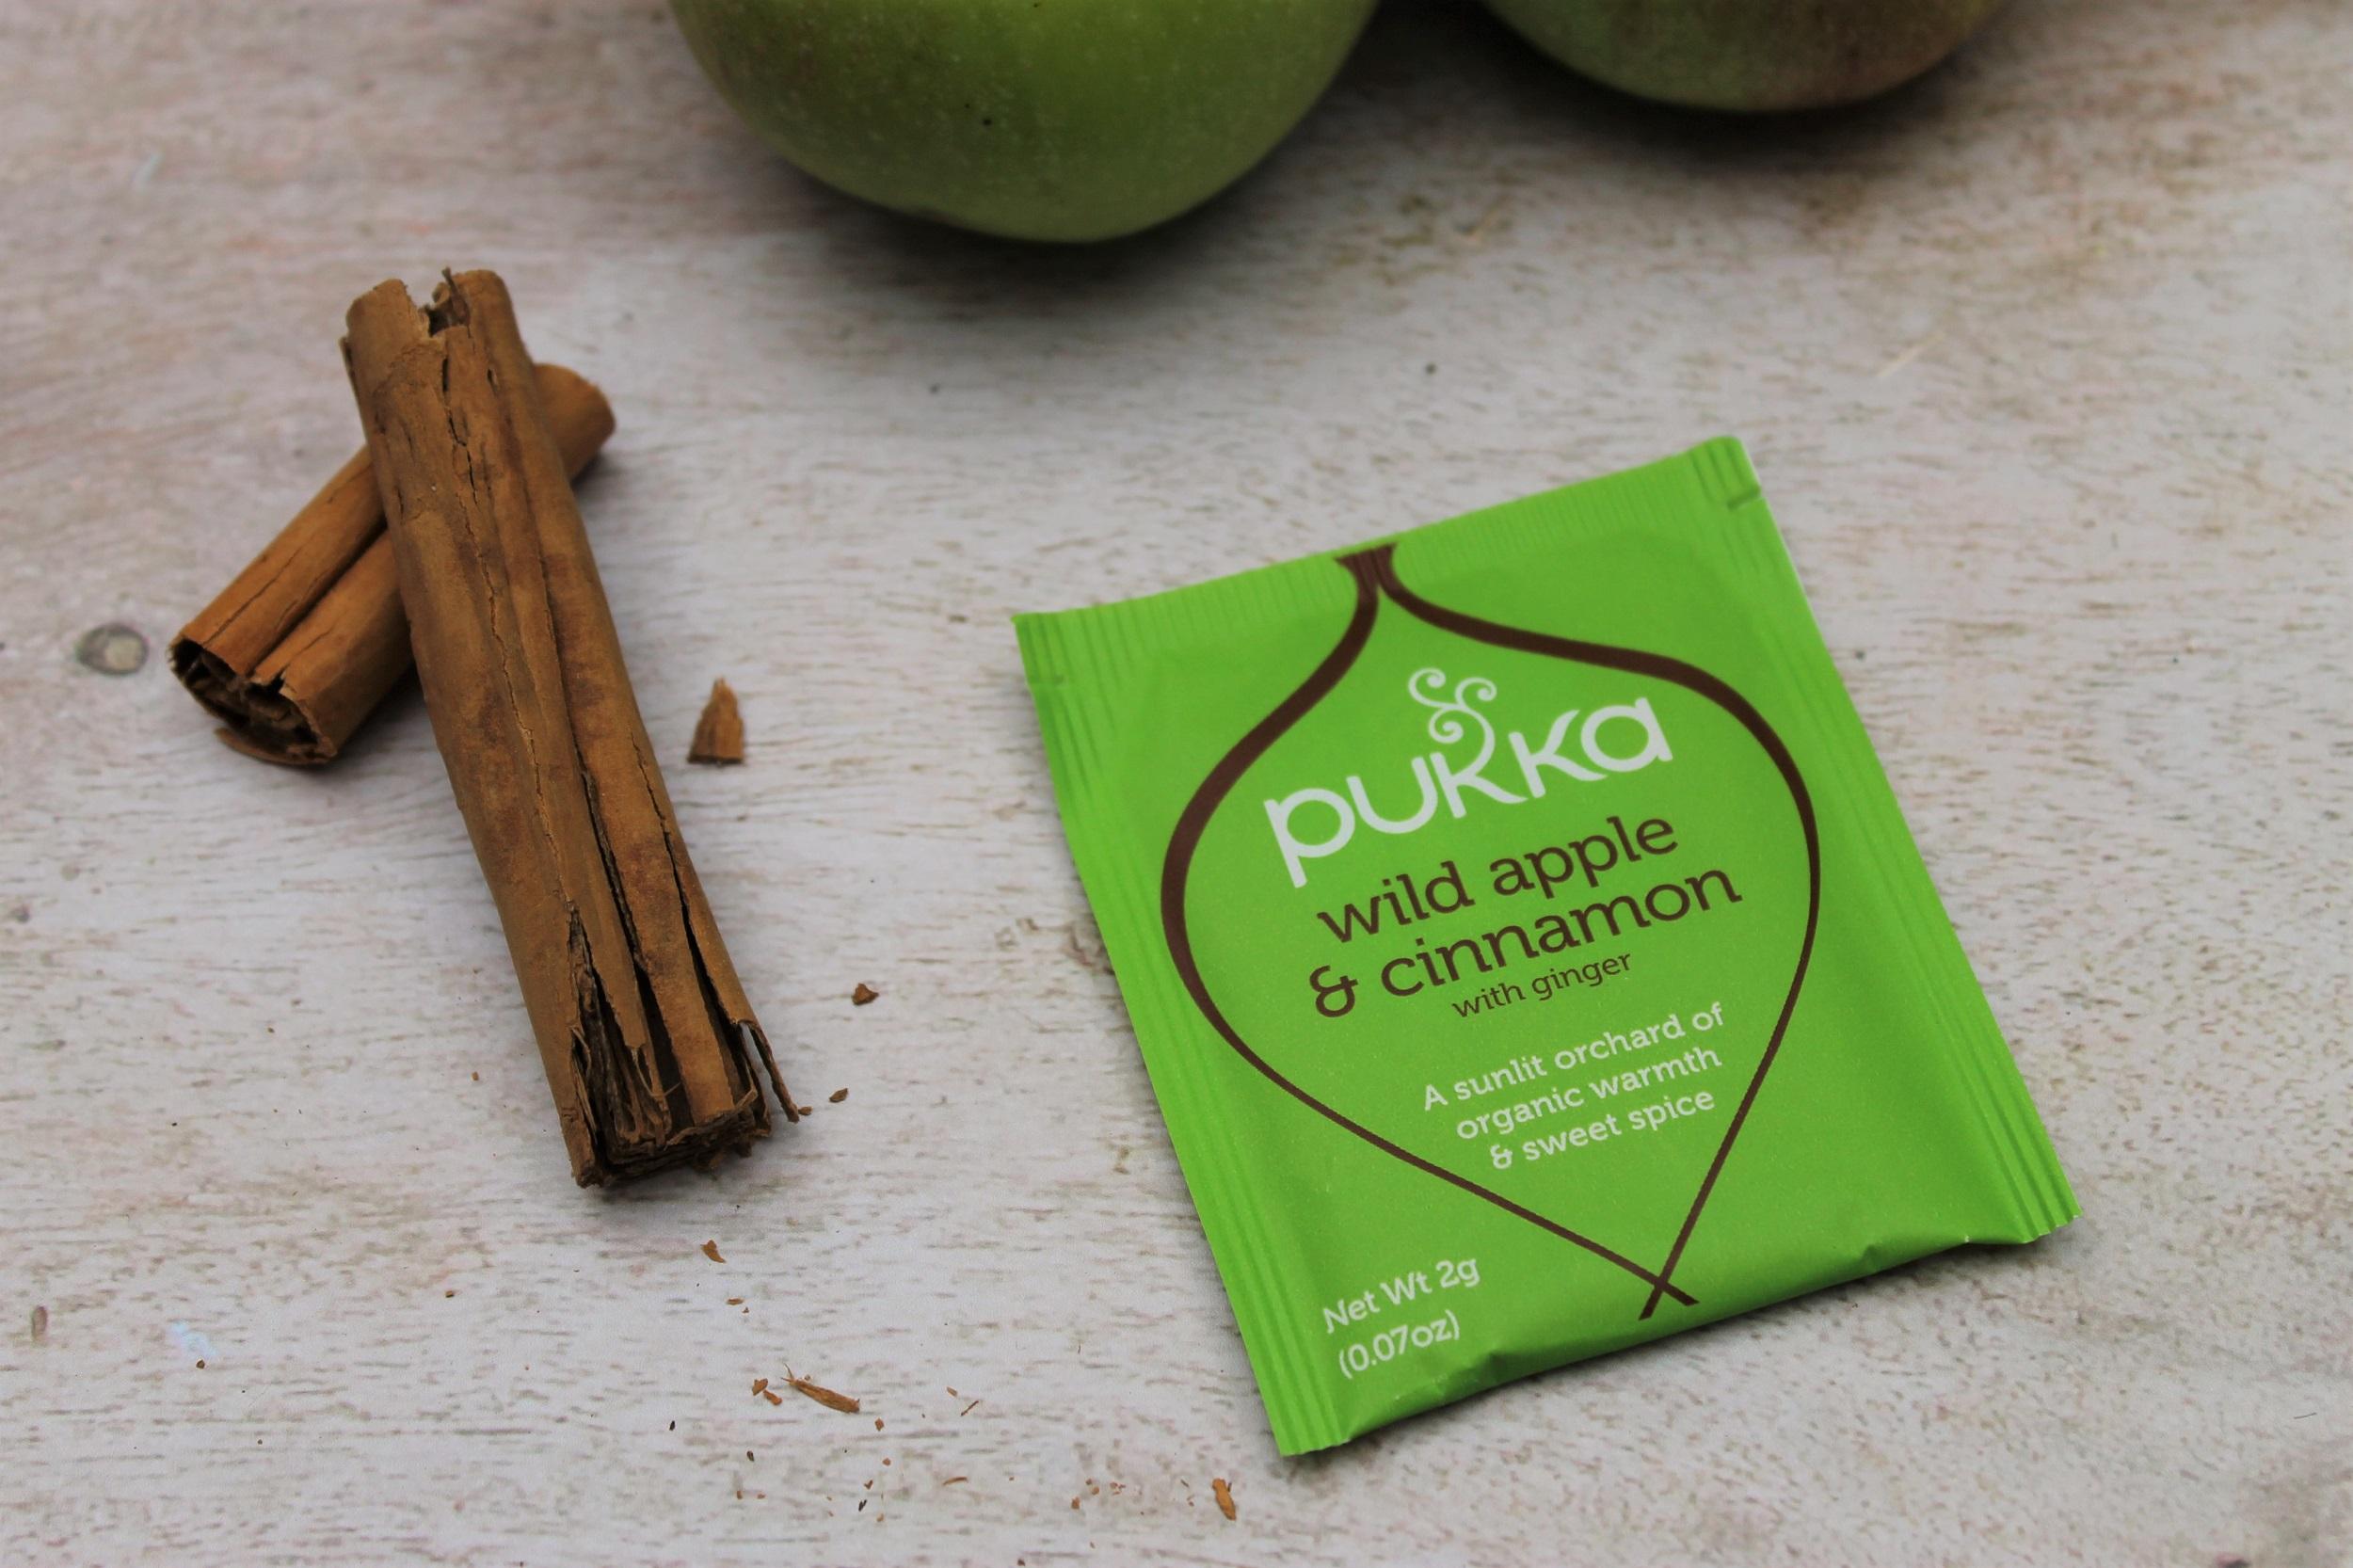 pukka wild apple cinnamon ginger teabags